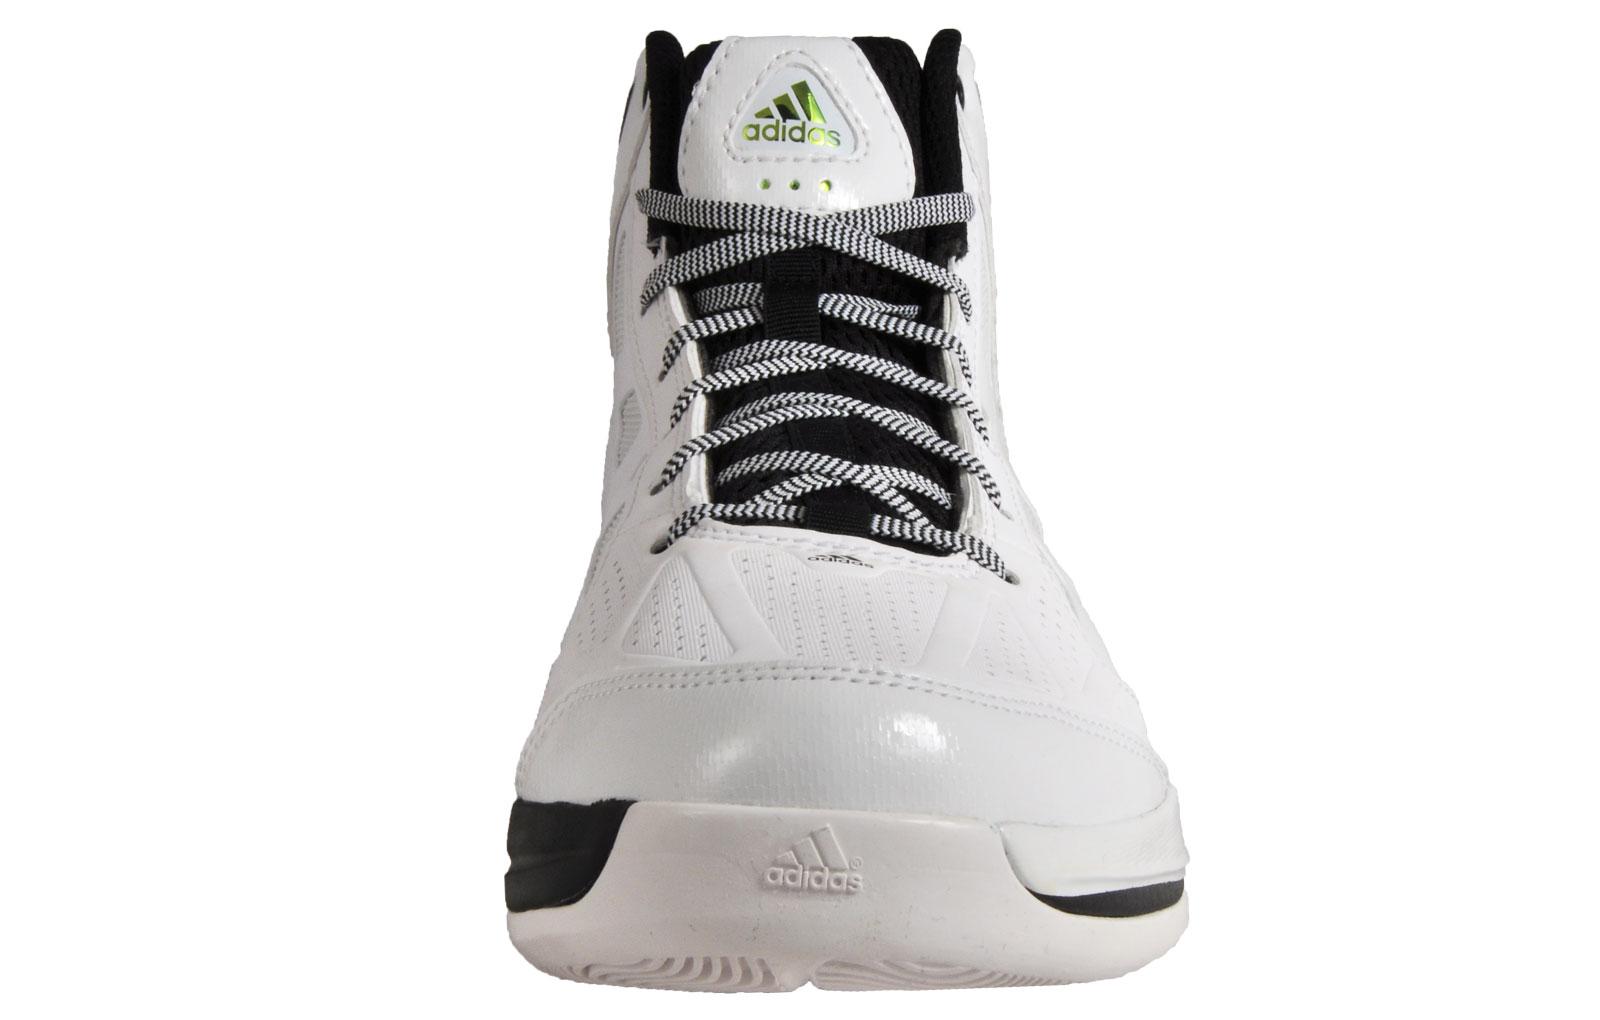 hot sale online 1228b e349e Adidas Crazy Shadow Mens Premium Basketball Mid Shoes White